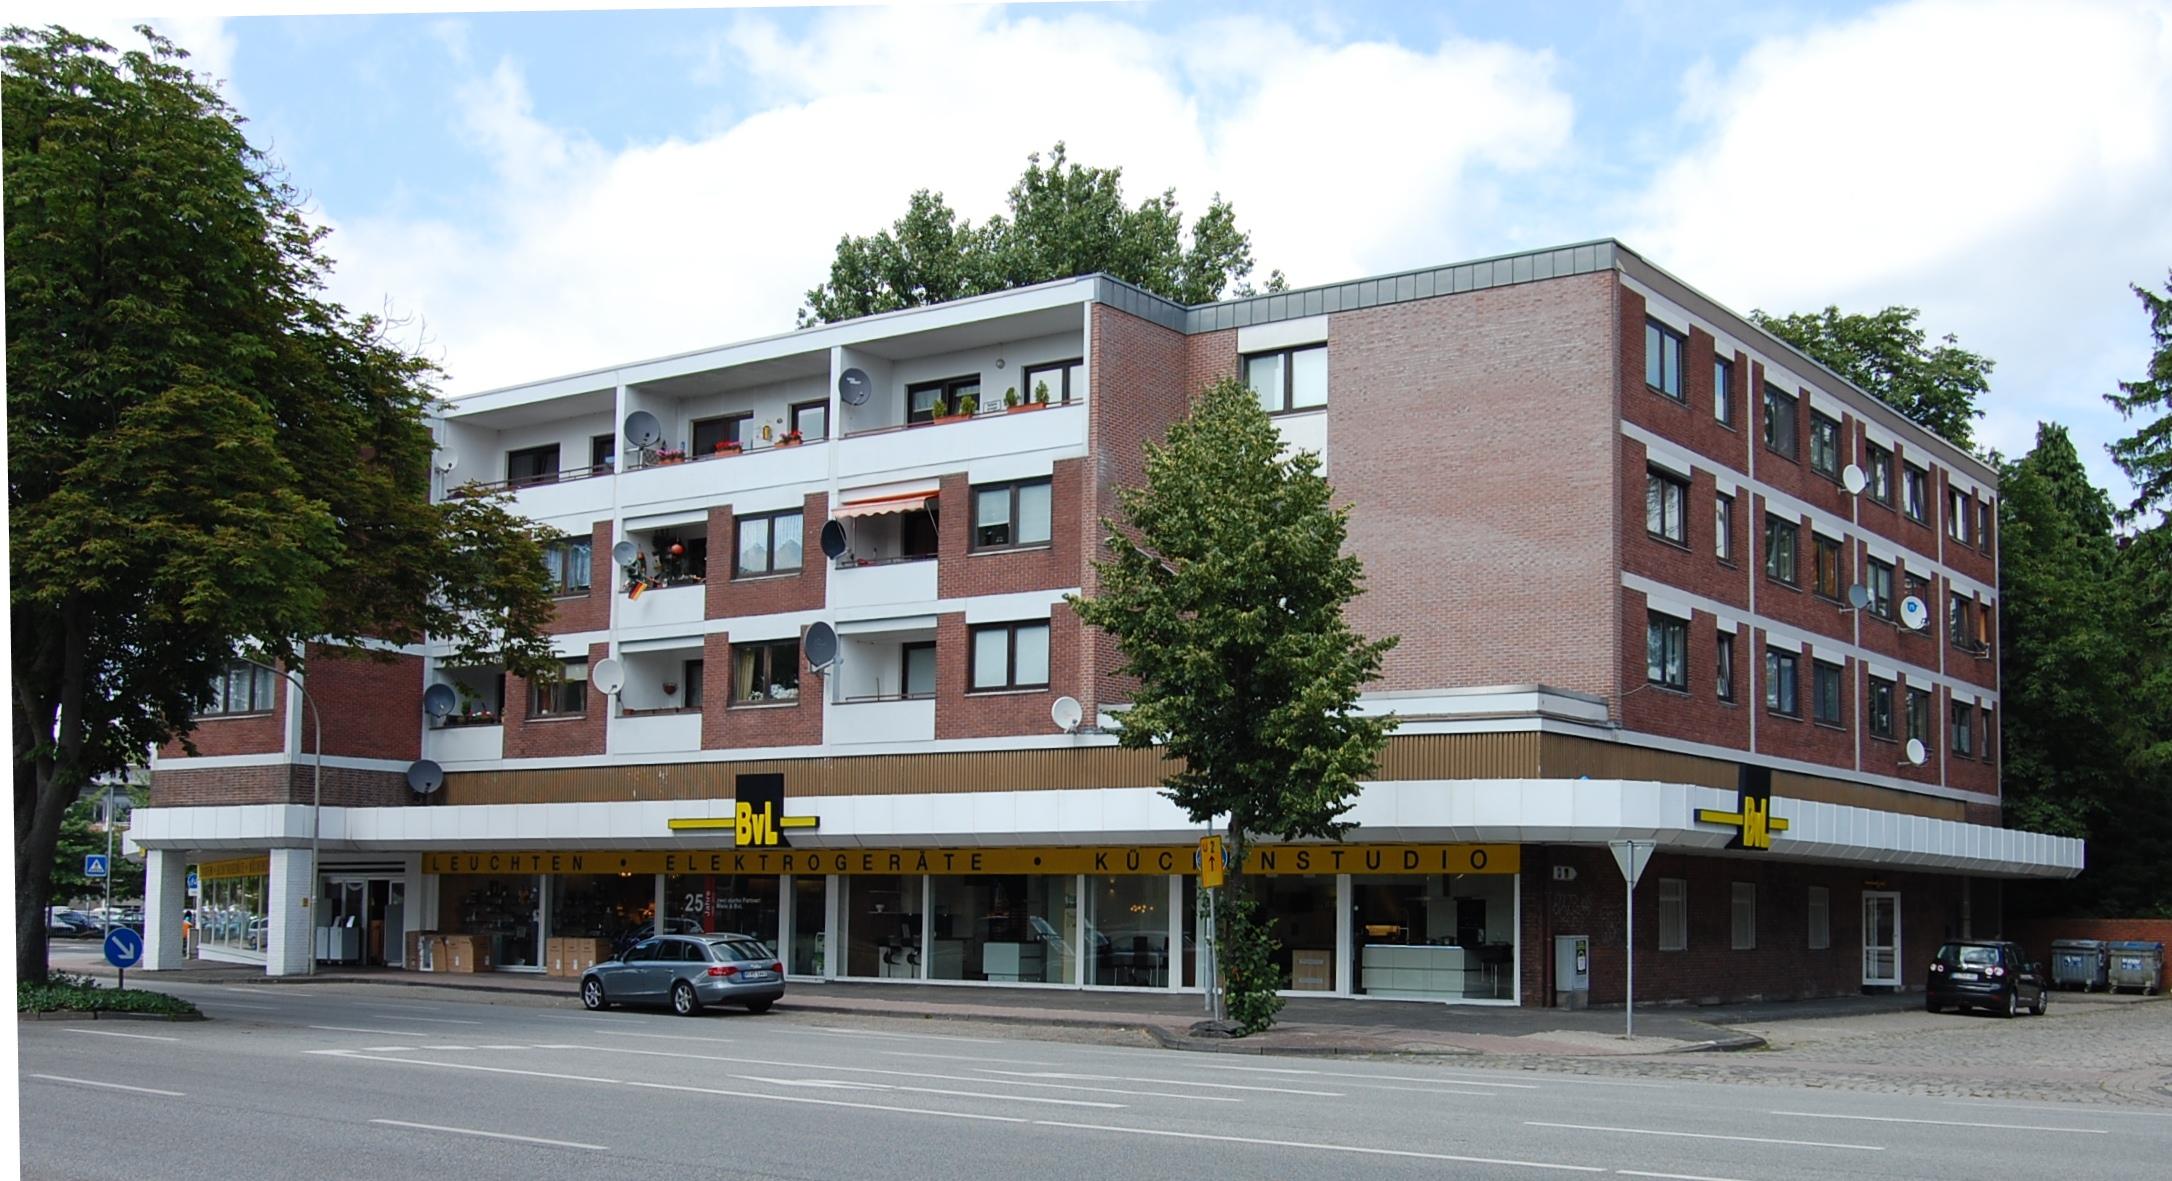 BVL keukens Nordhorn